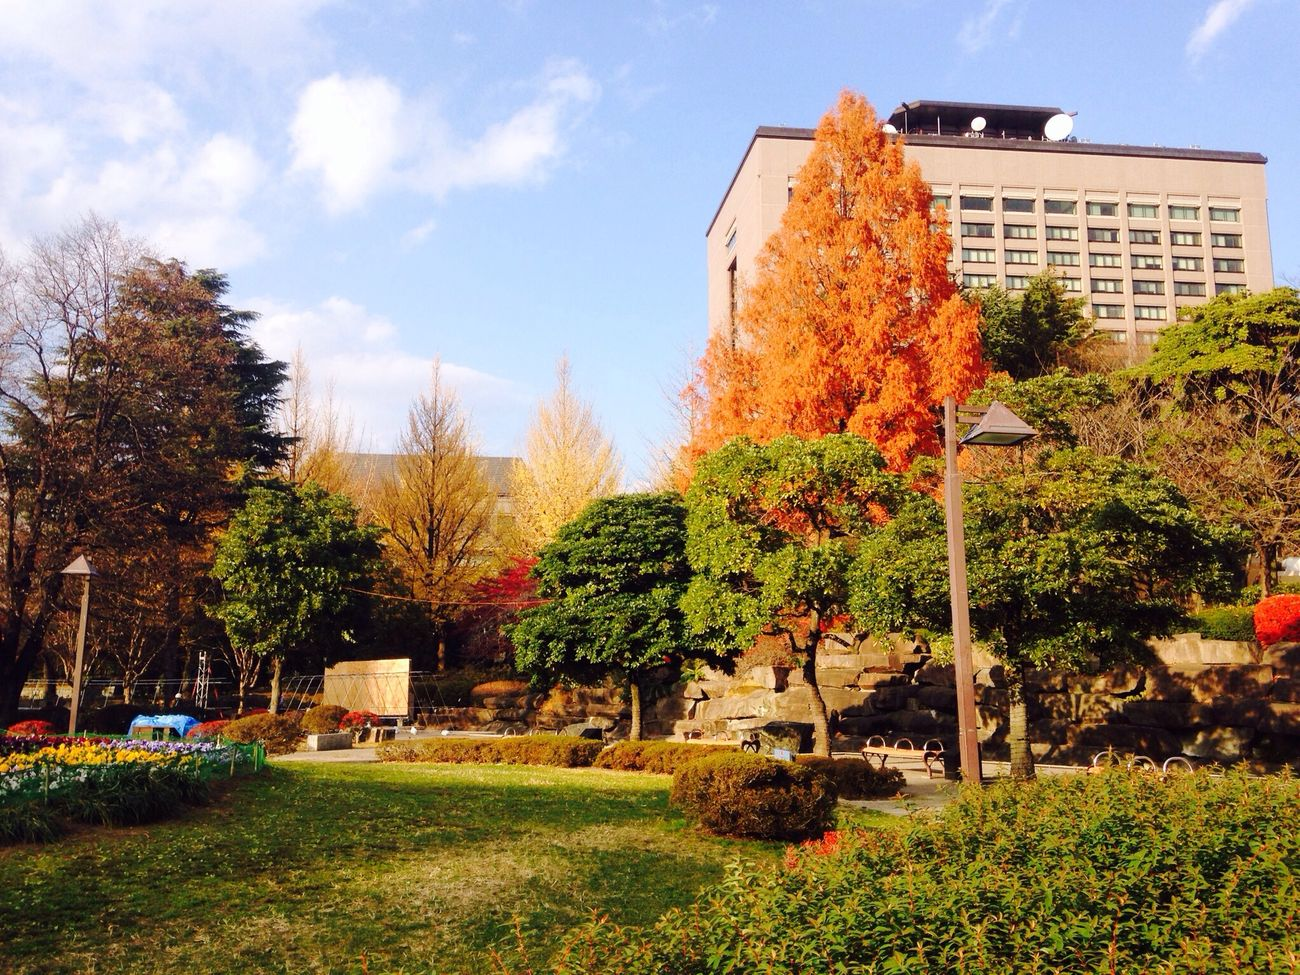 Sendai-shi Park Colourful